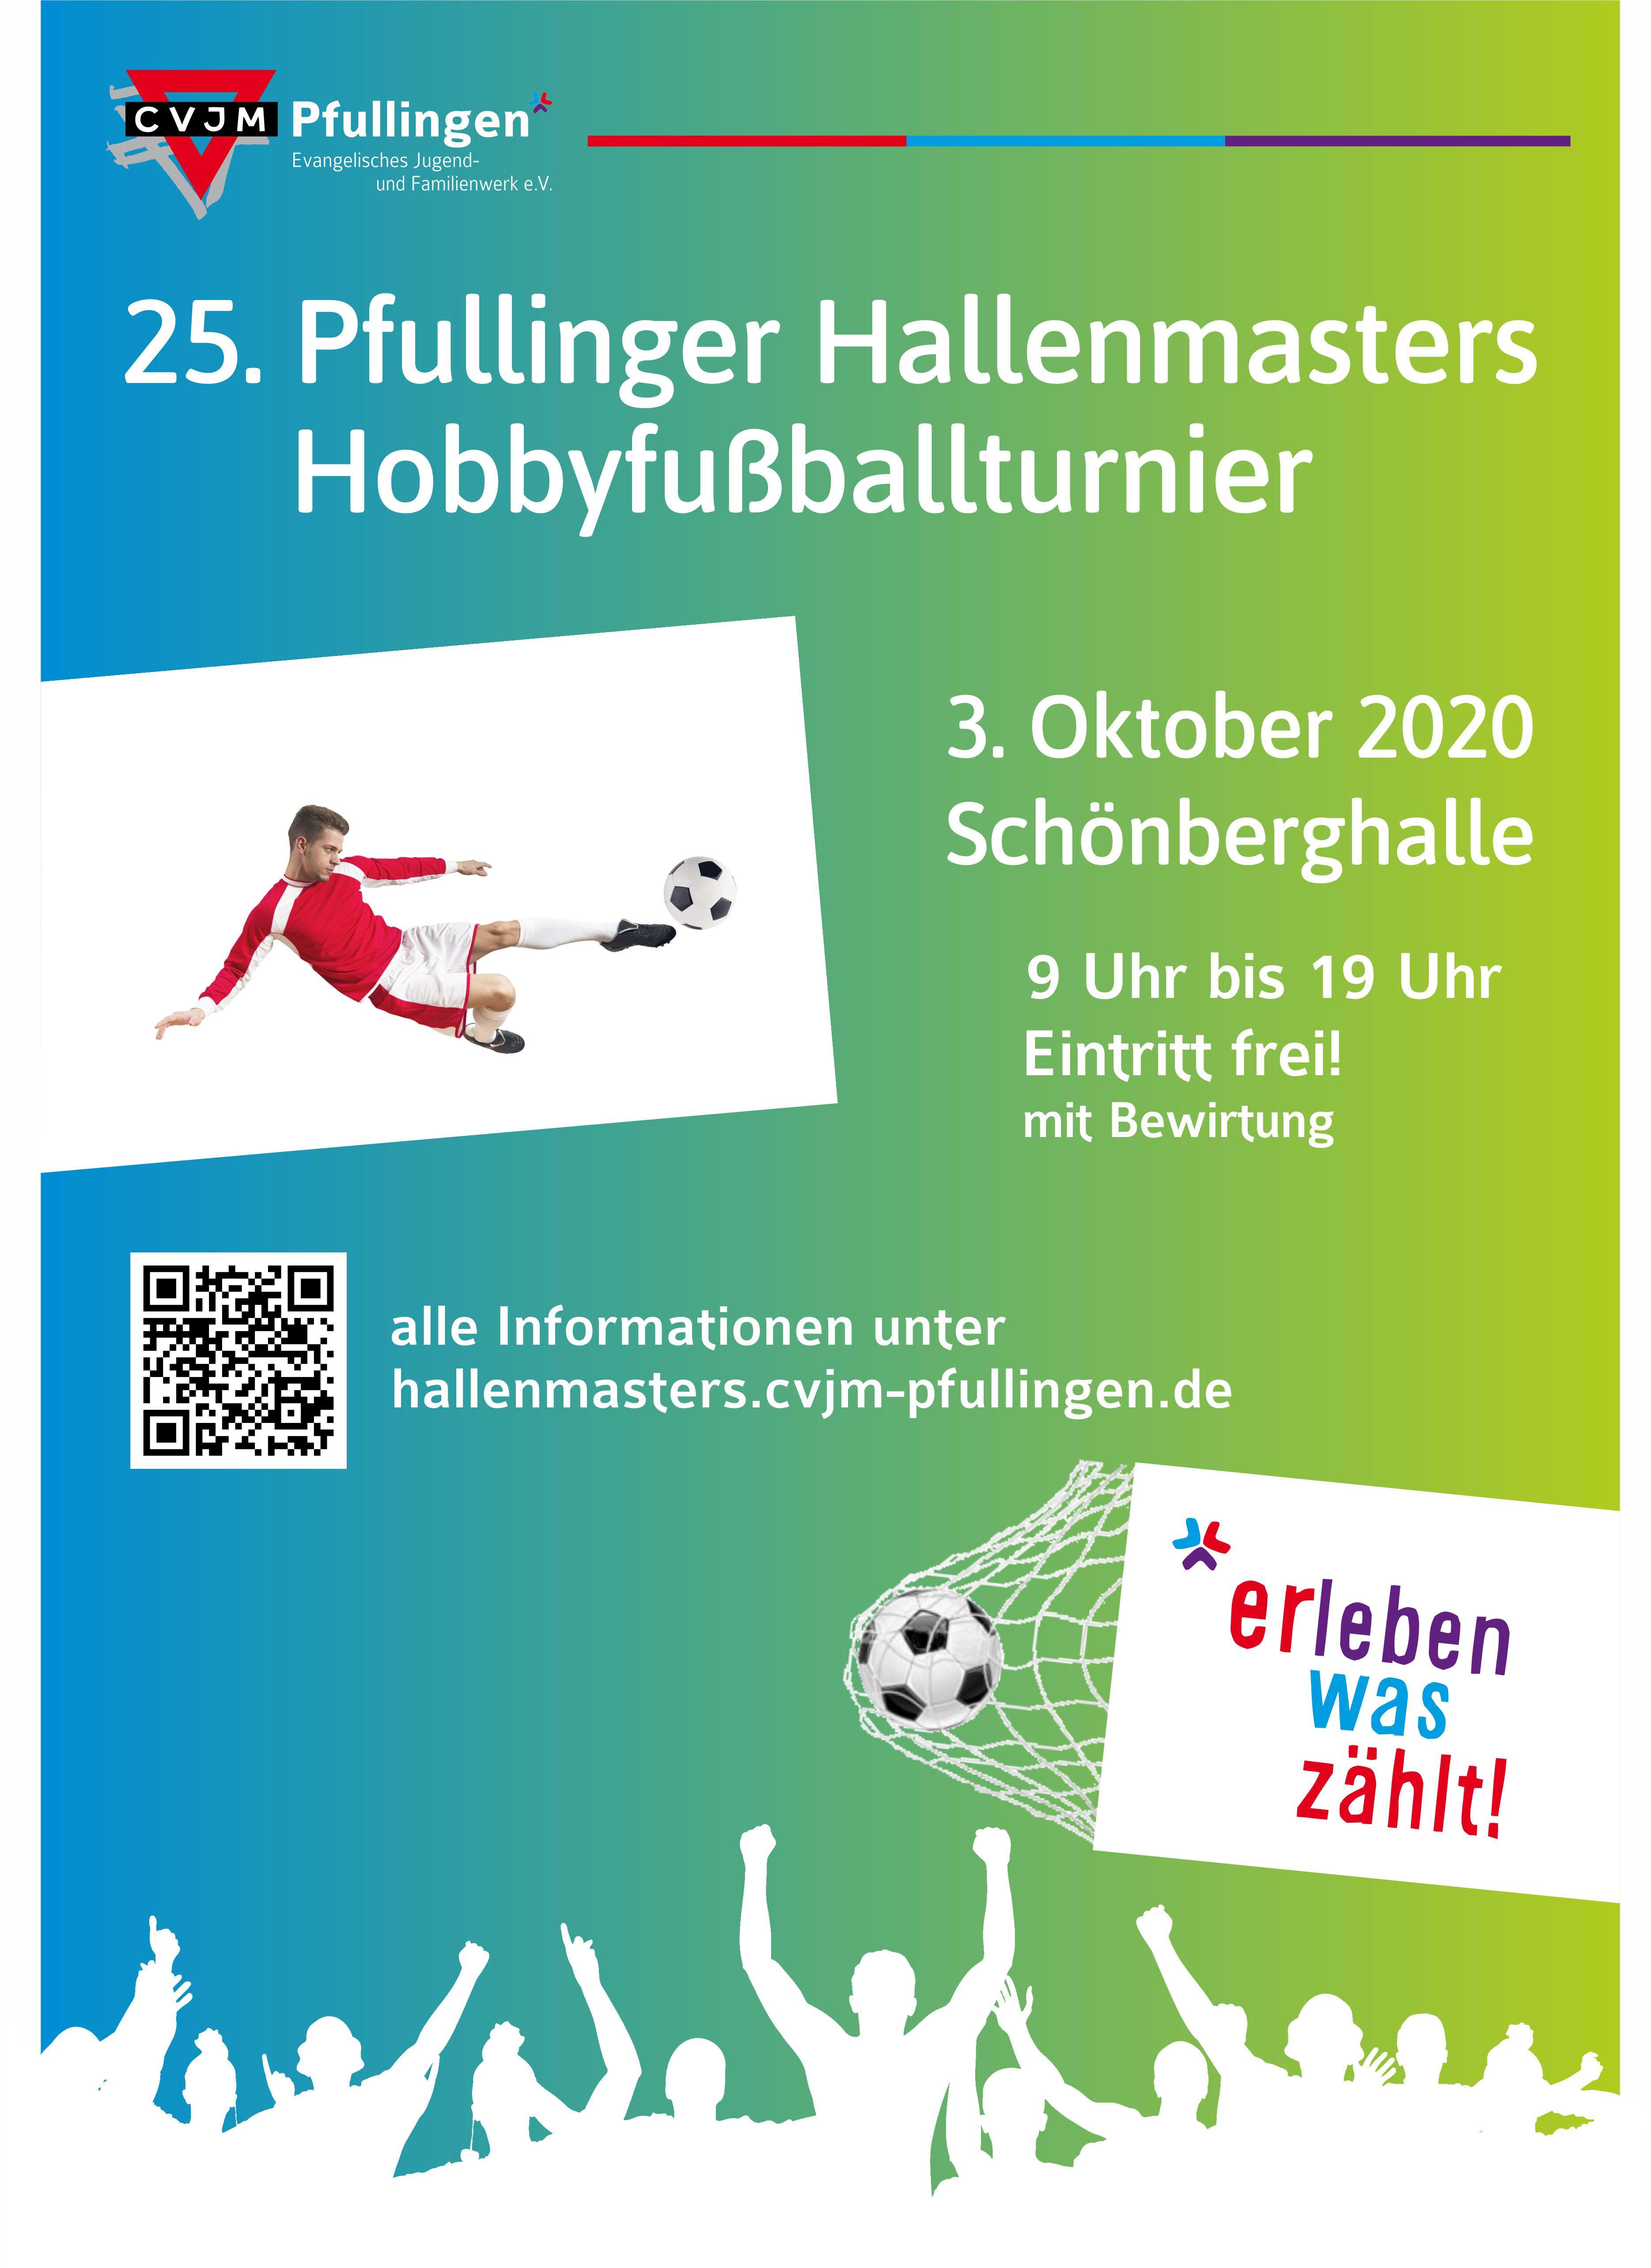 2020-10-06-kolpinghaus-team-holt-2-Platz-beim-pfullinger-hallenmasters-5